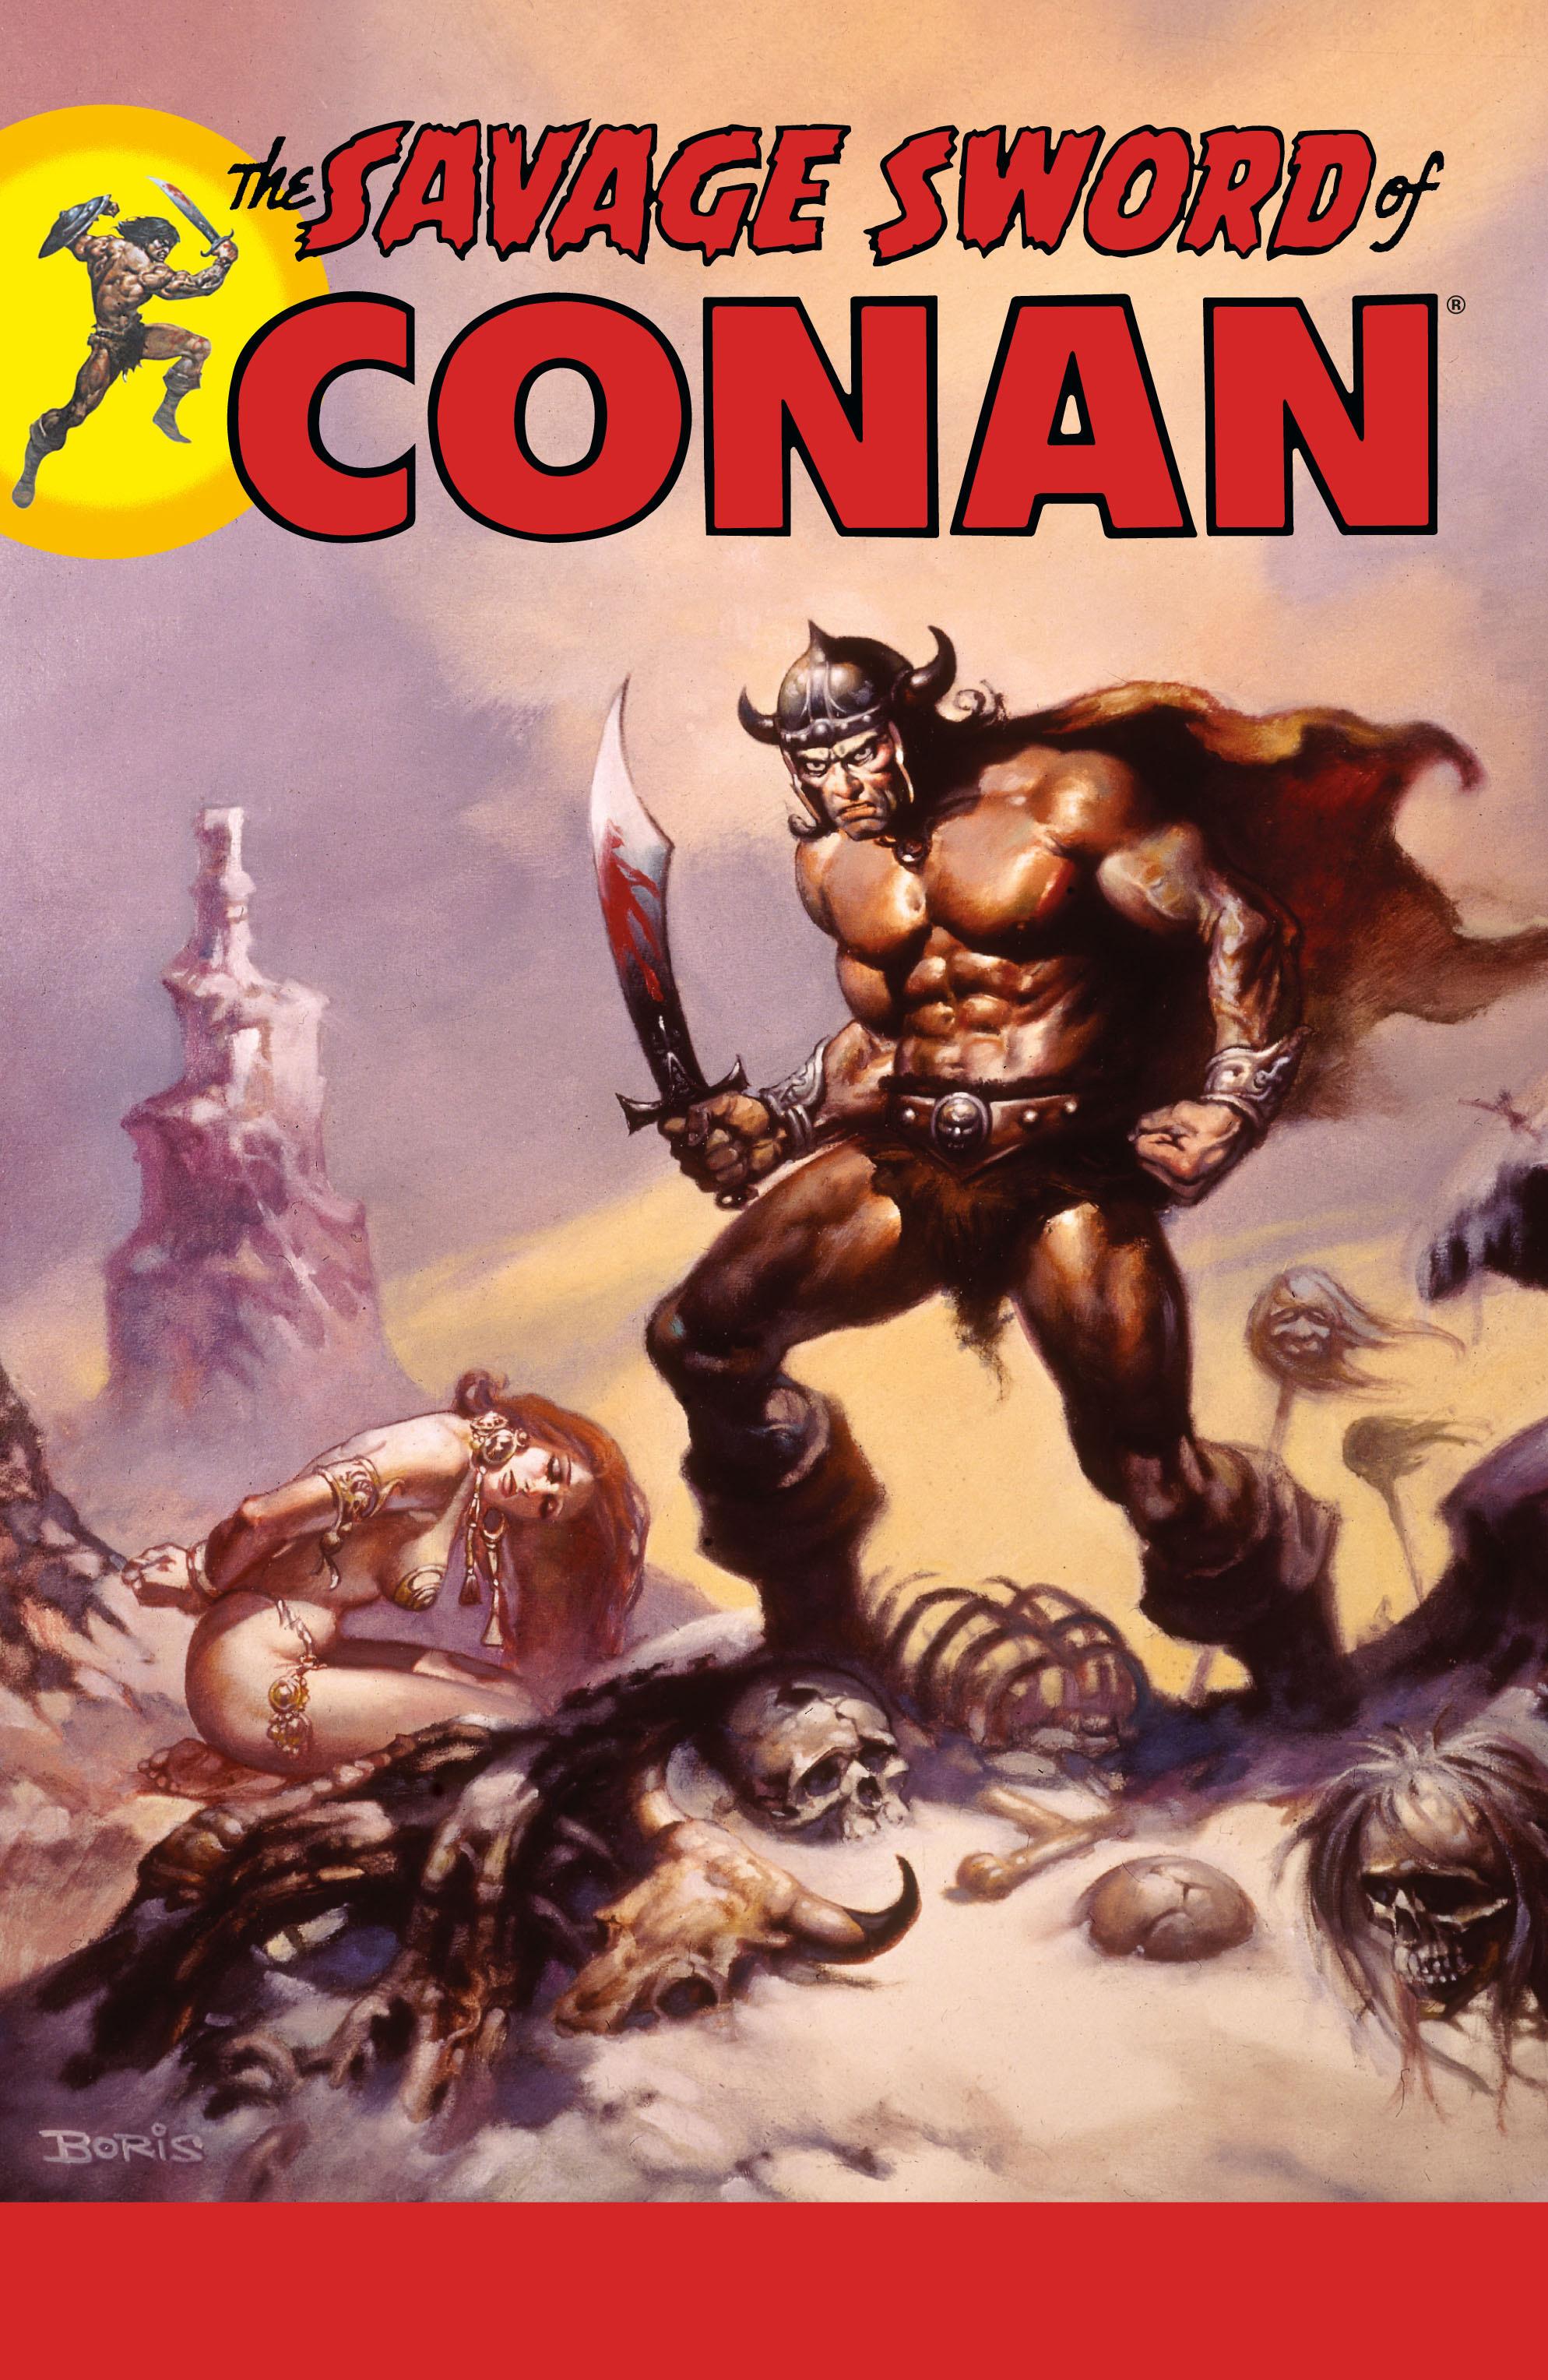 The Savage Sword of Conan v1-000.jpg